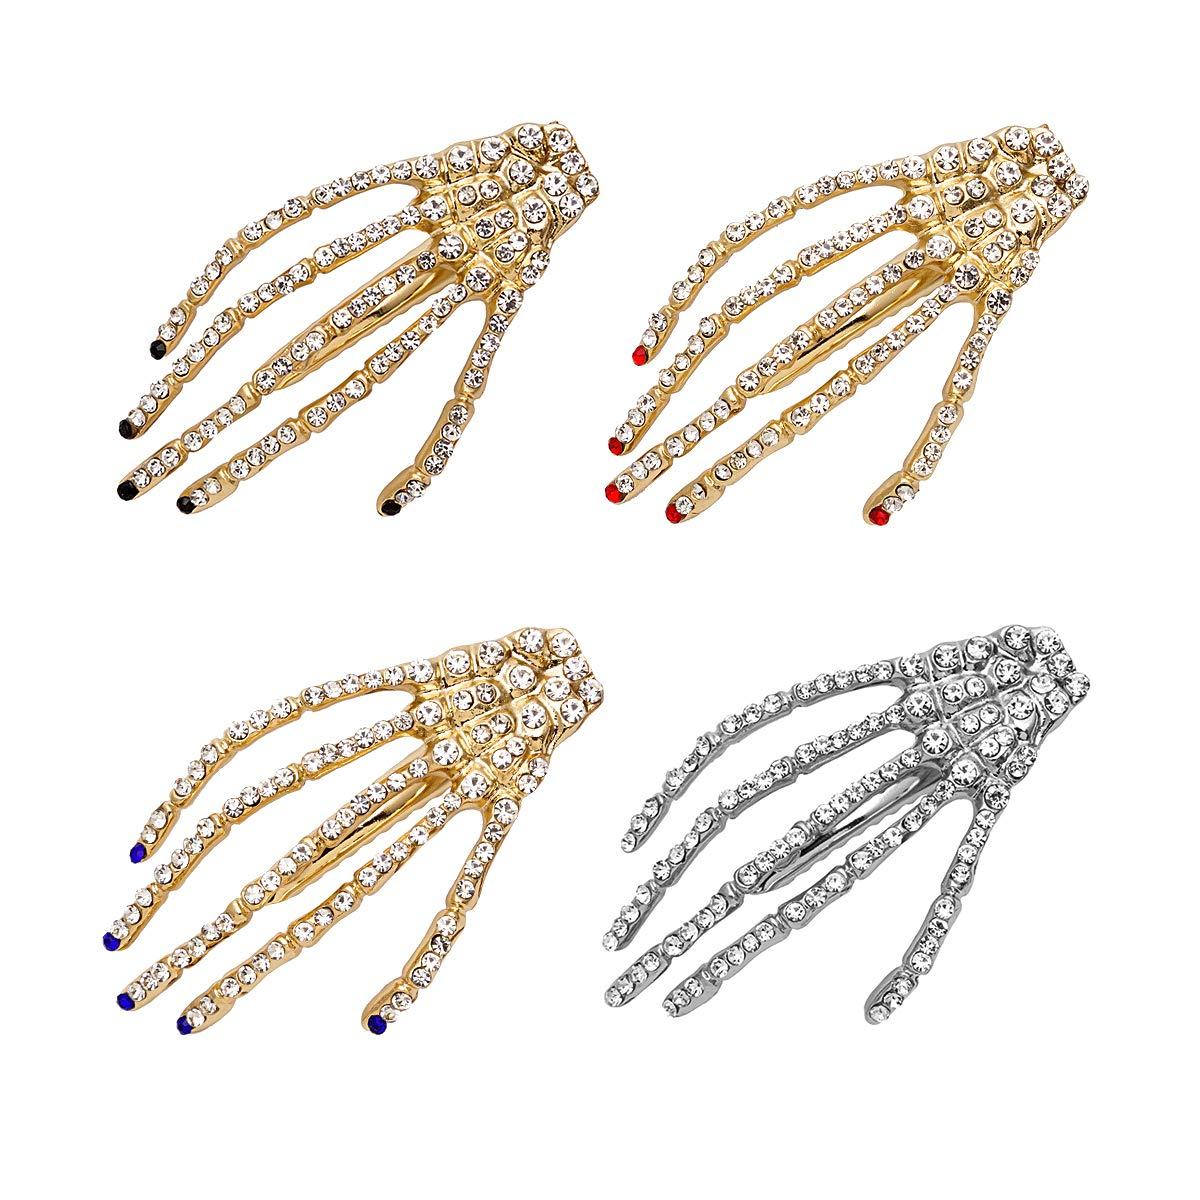 Rhinestone Skeleton Hand Hair Clip For Christmas Women Girls Crystal Spark Hair Slides Skull Hand Bone Hair Barrette Claws Gothic Hairpin Ladies Thansgiving New Year Birthday Valentine Present Halloween Cosplay Party Décor Accessories Set 4 Pack